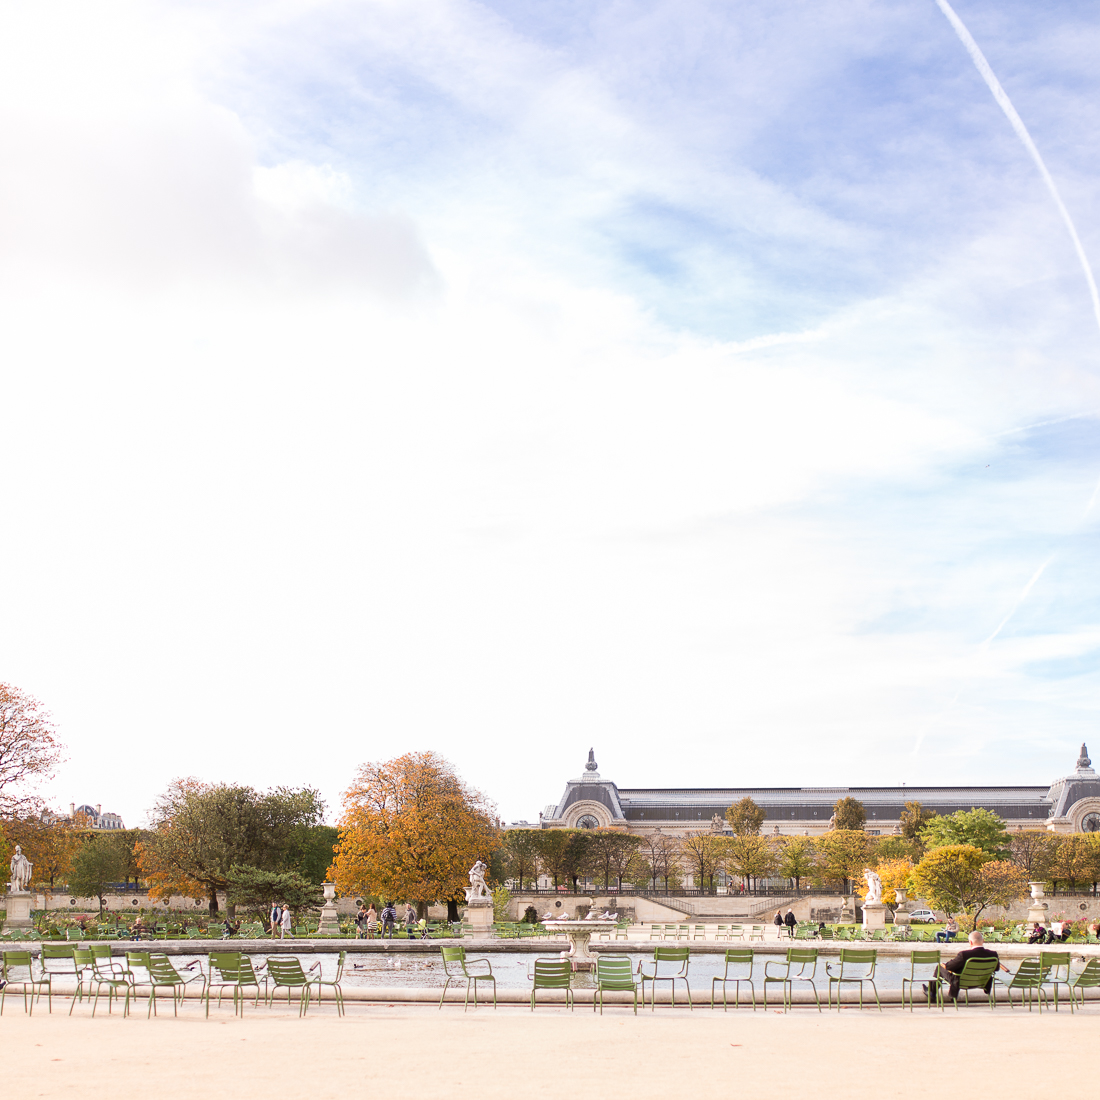 spring-fall-family-maternity-paris-palais-royal-louvre-photo-session-inspiration-18